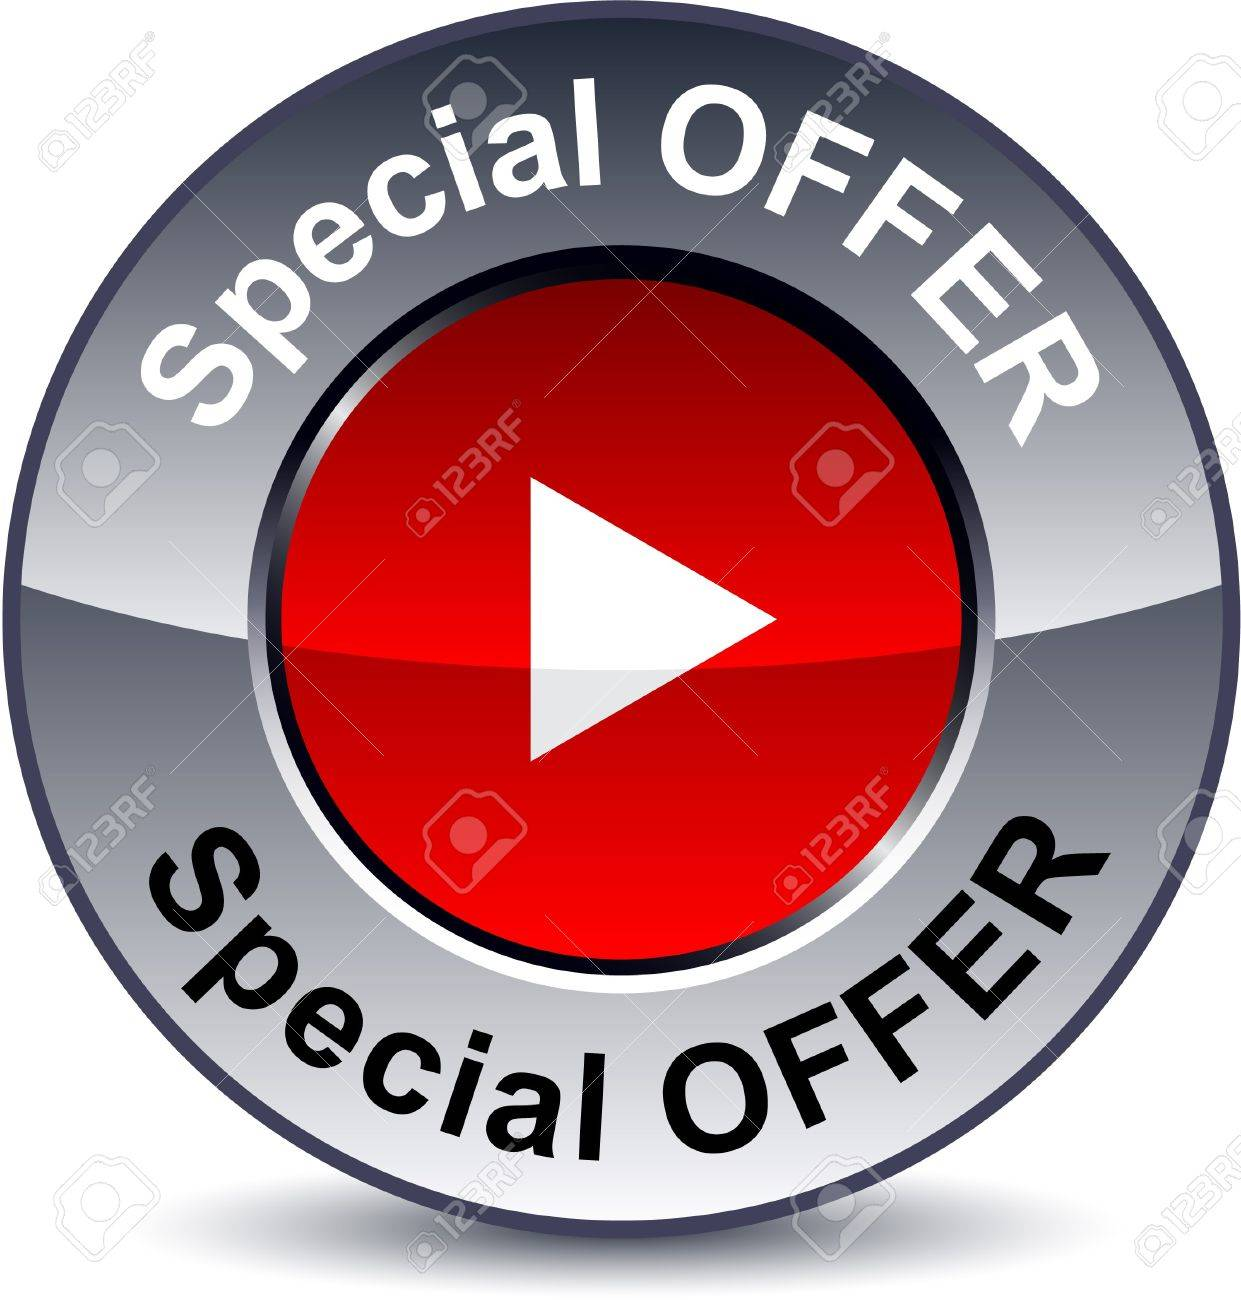 Special offer round metallic button. Vector. Stock Vector - 7509388